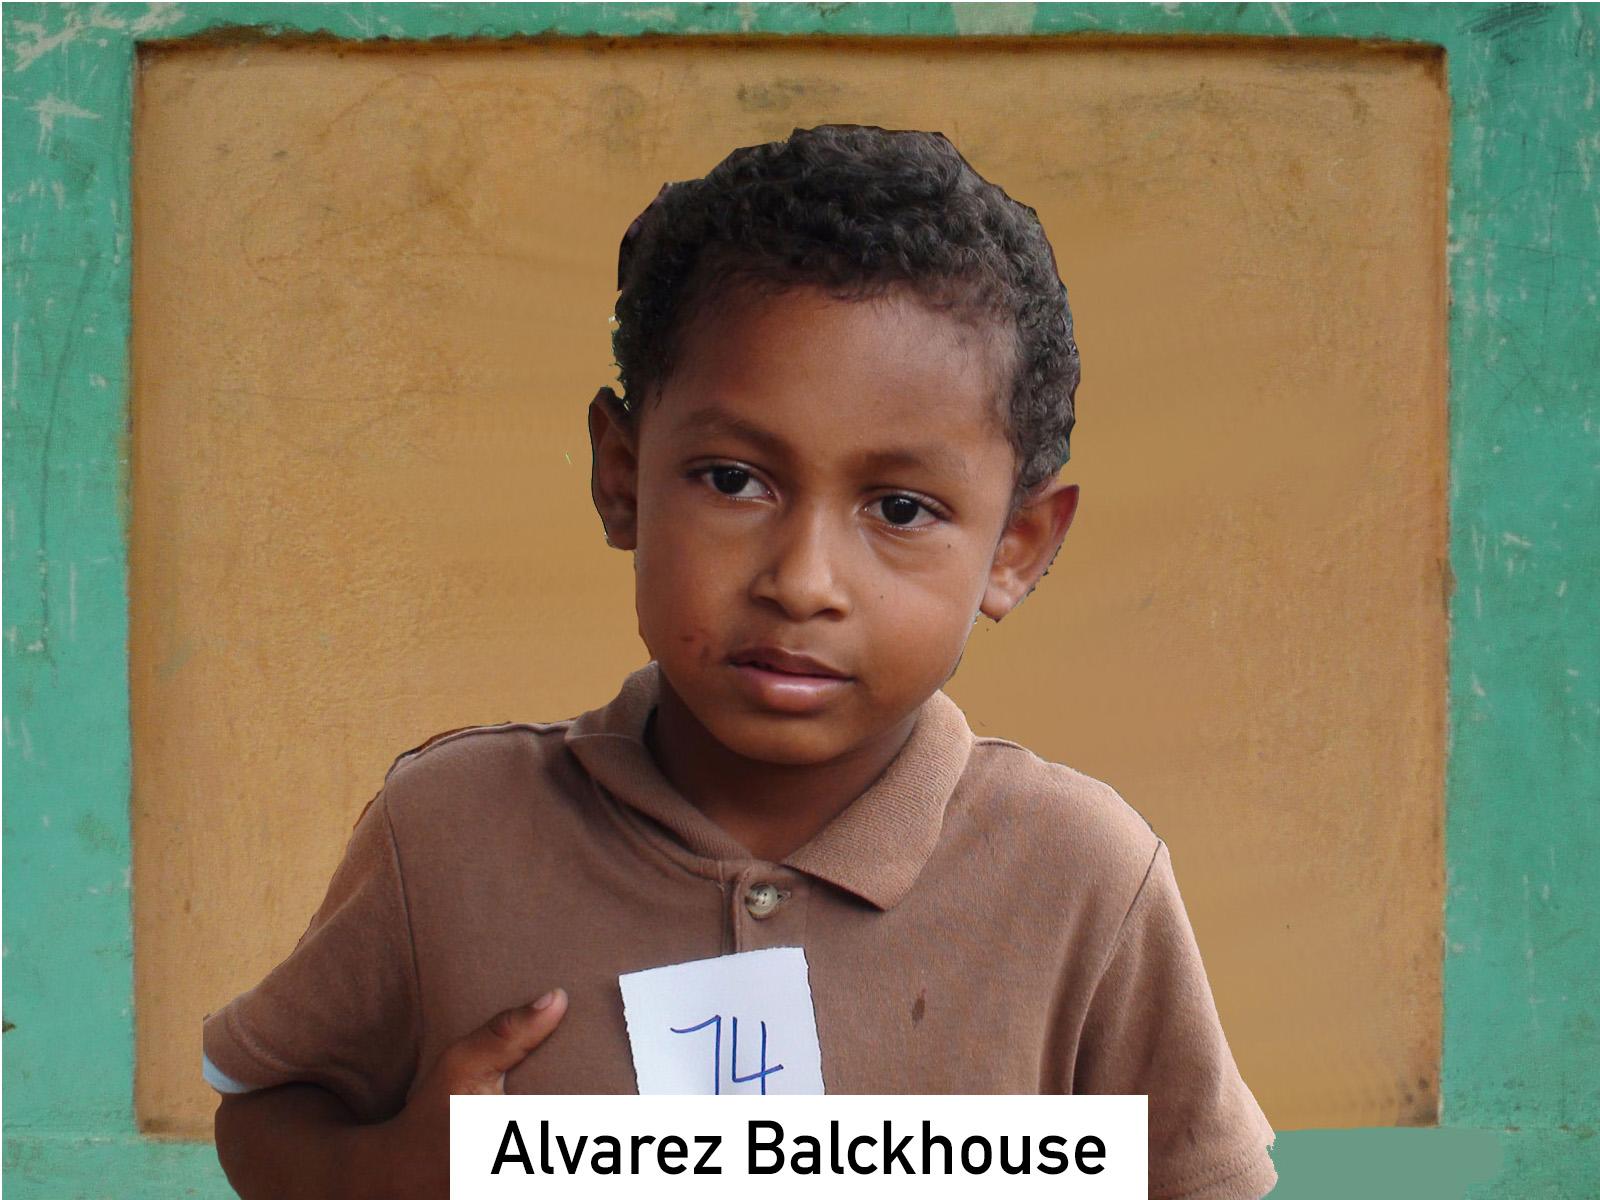 074 - Alvarez Balckhouse.jpg